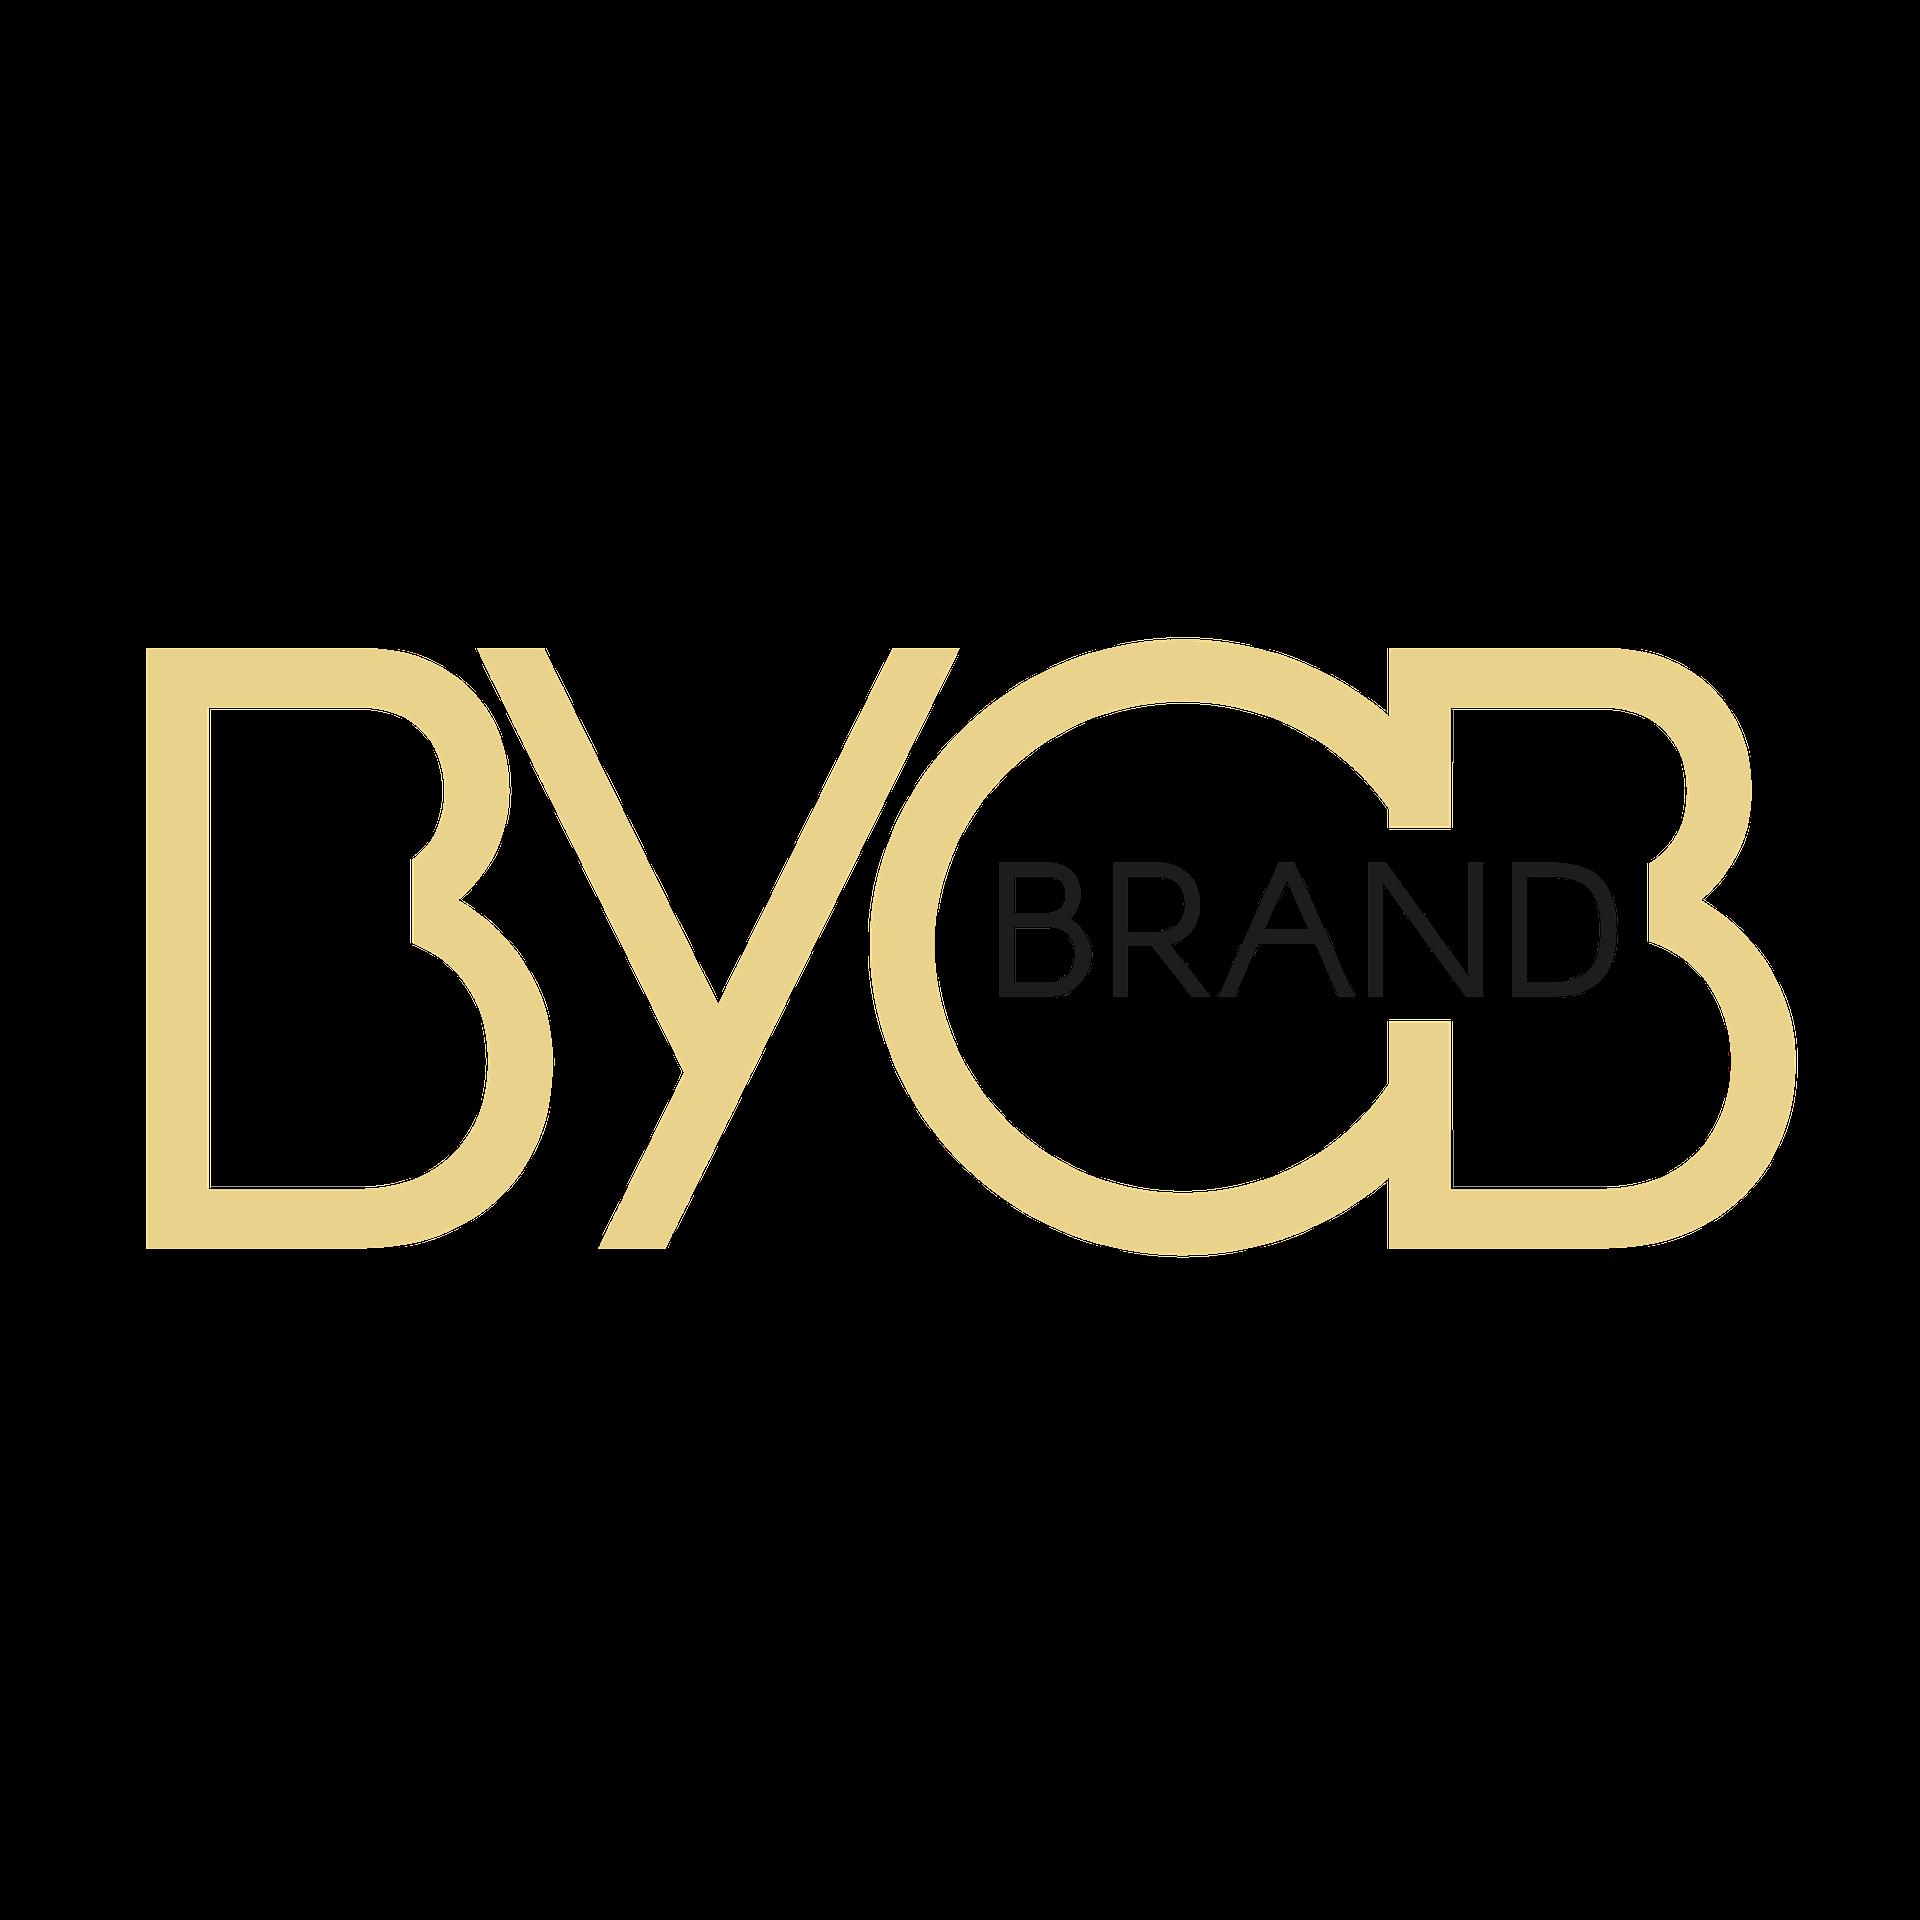 BYOBrand Podcast